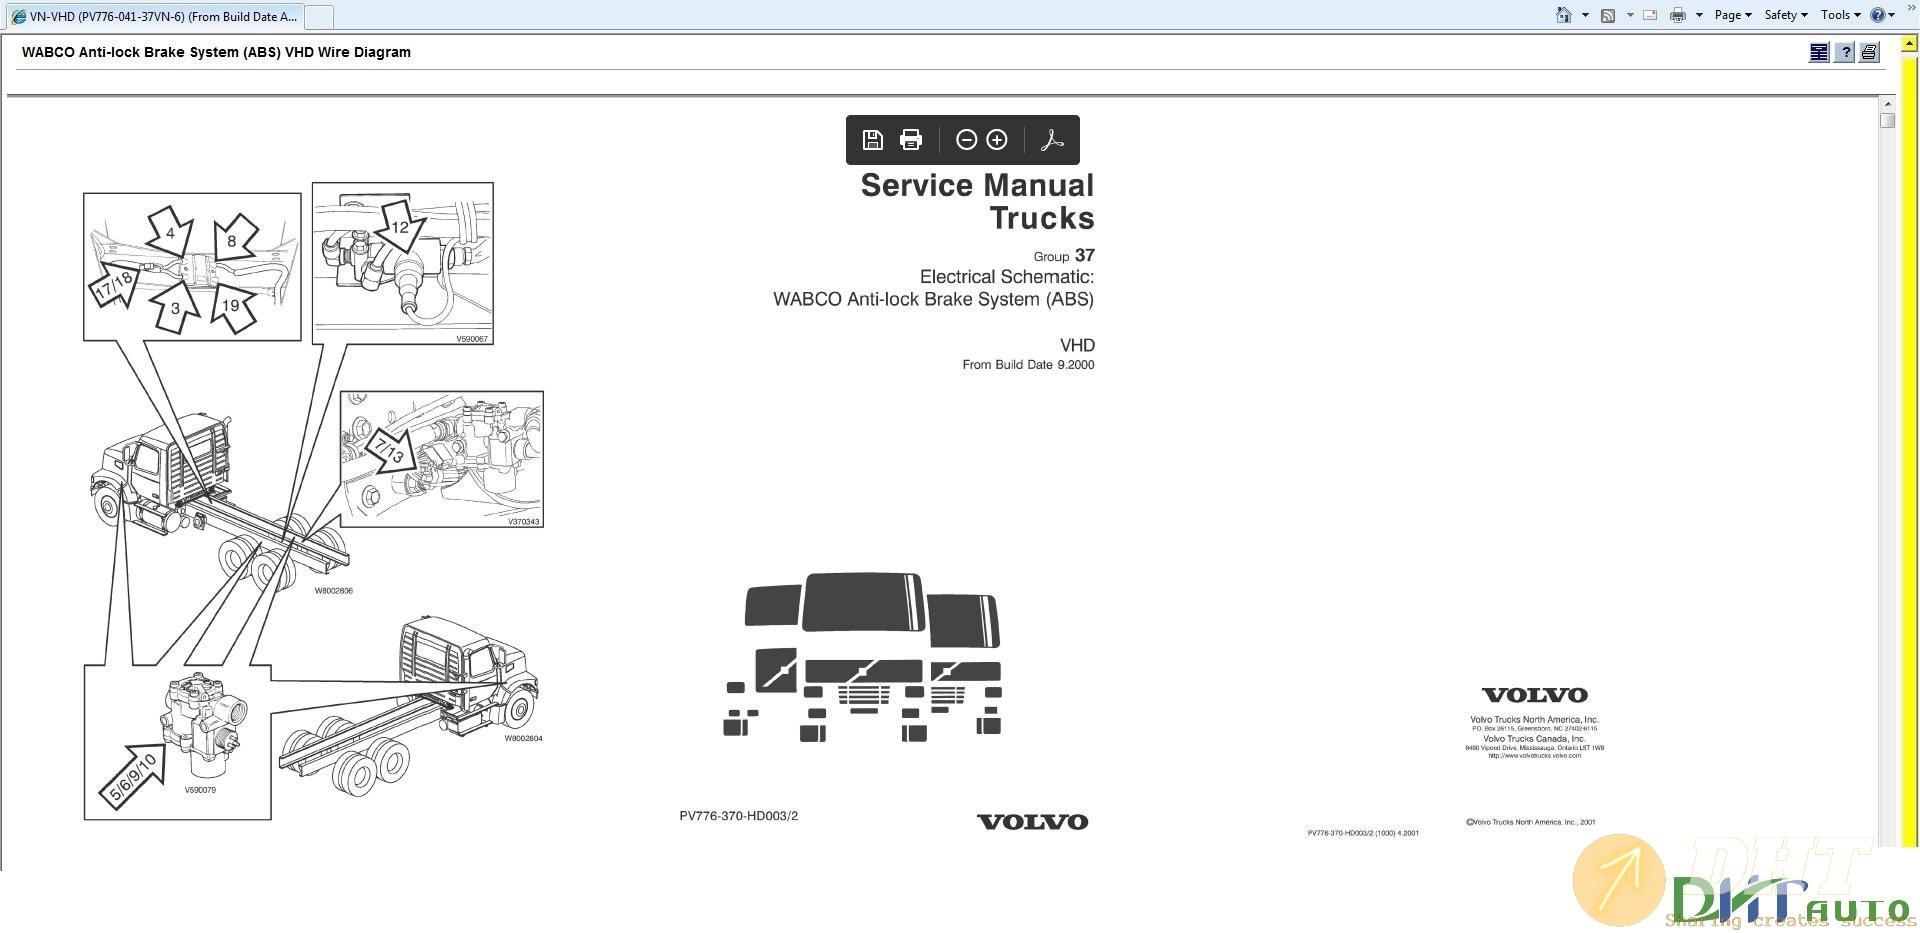 Volvo-Truck-EWD-Electrical-Wiring-Documentation-Updated-04-2016-3.jpg